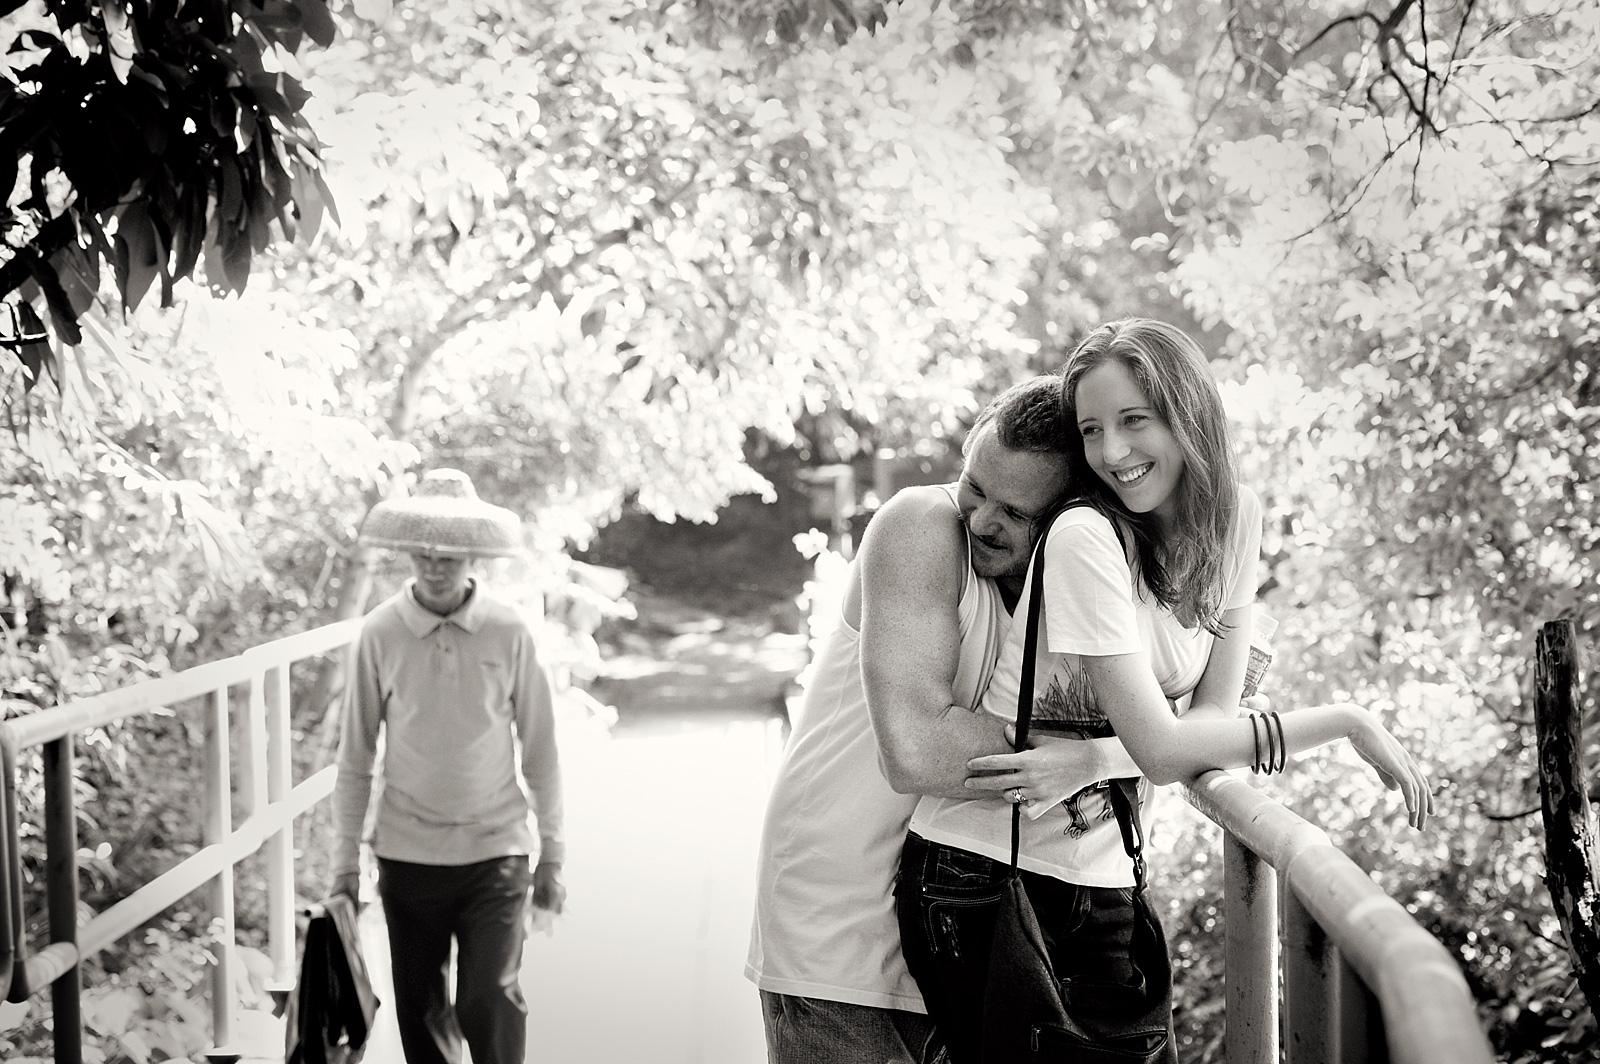 Hong-Kong-Engagement-Shoot-South-African-Wedding-Photographer-Jacki-Bruniquel-01